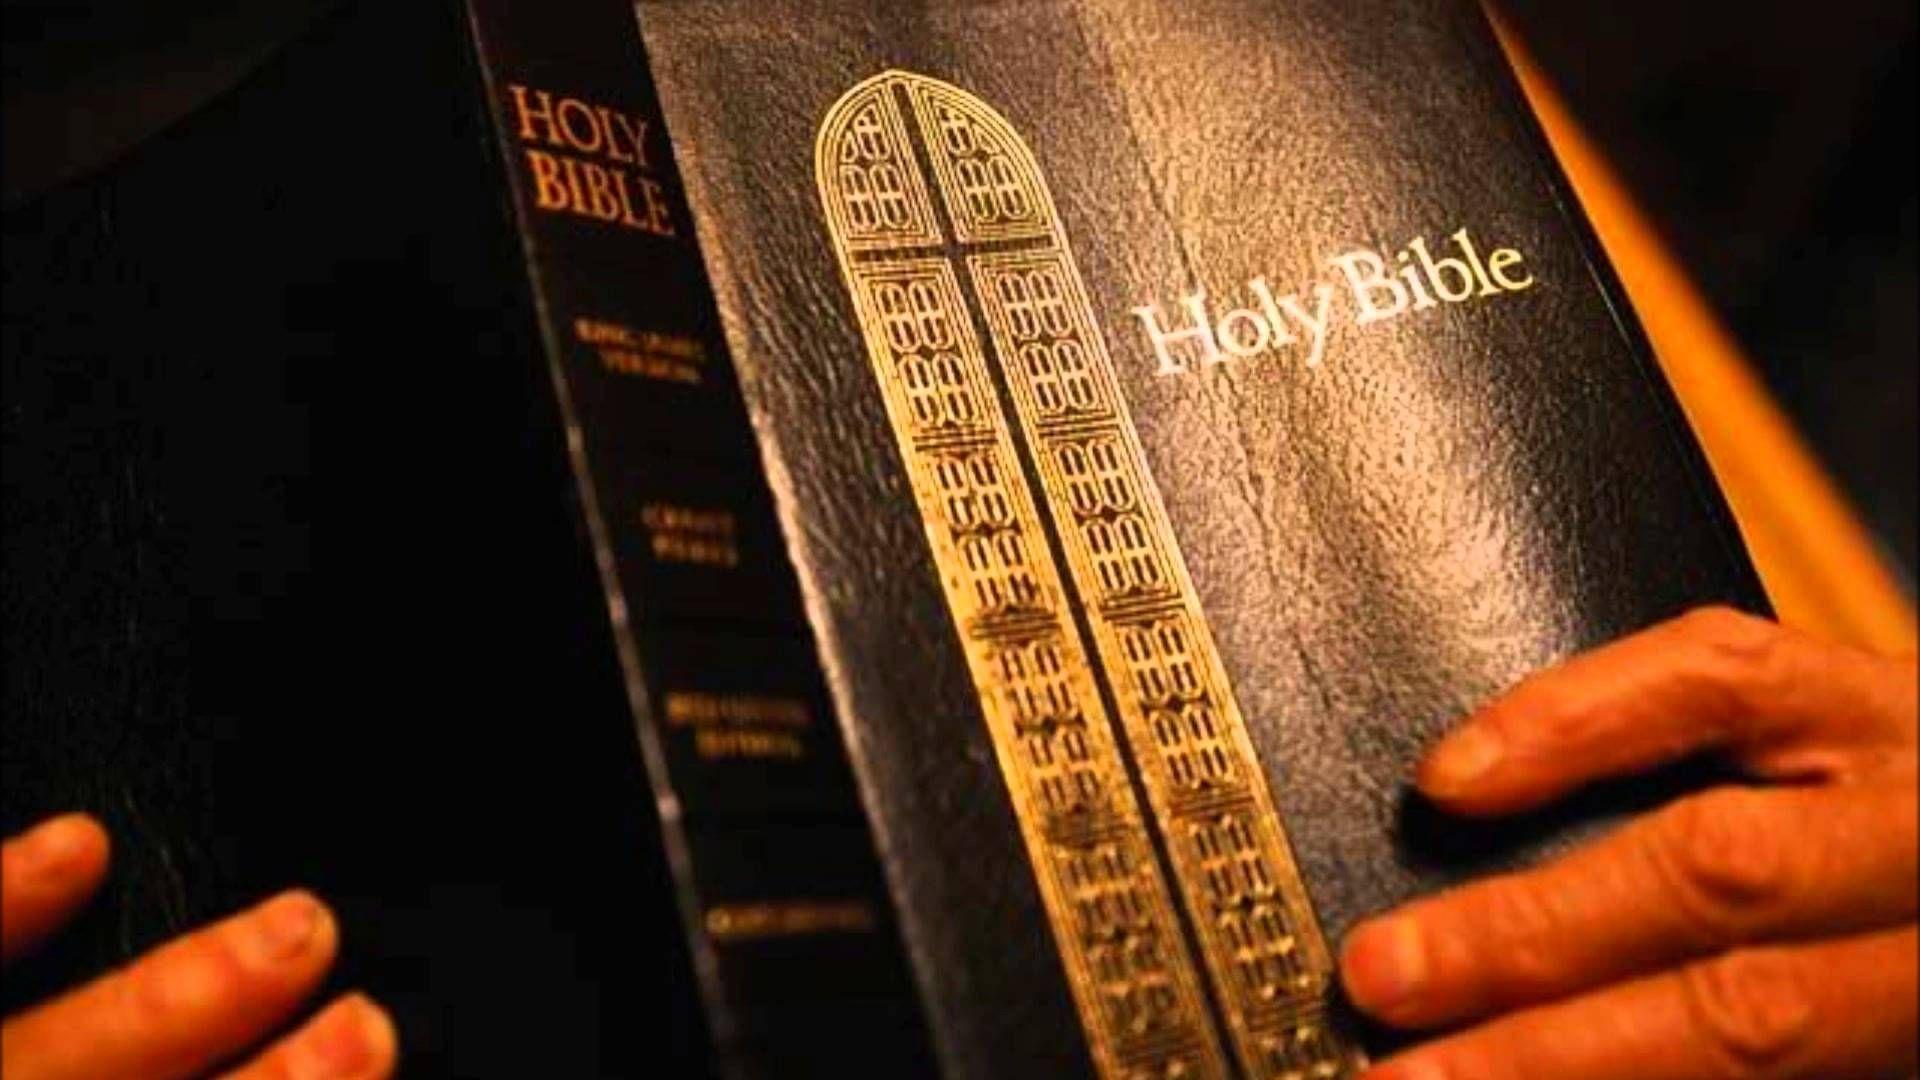 Book of Psalms KJV | All God's Children the Way back from Oz